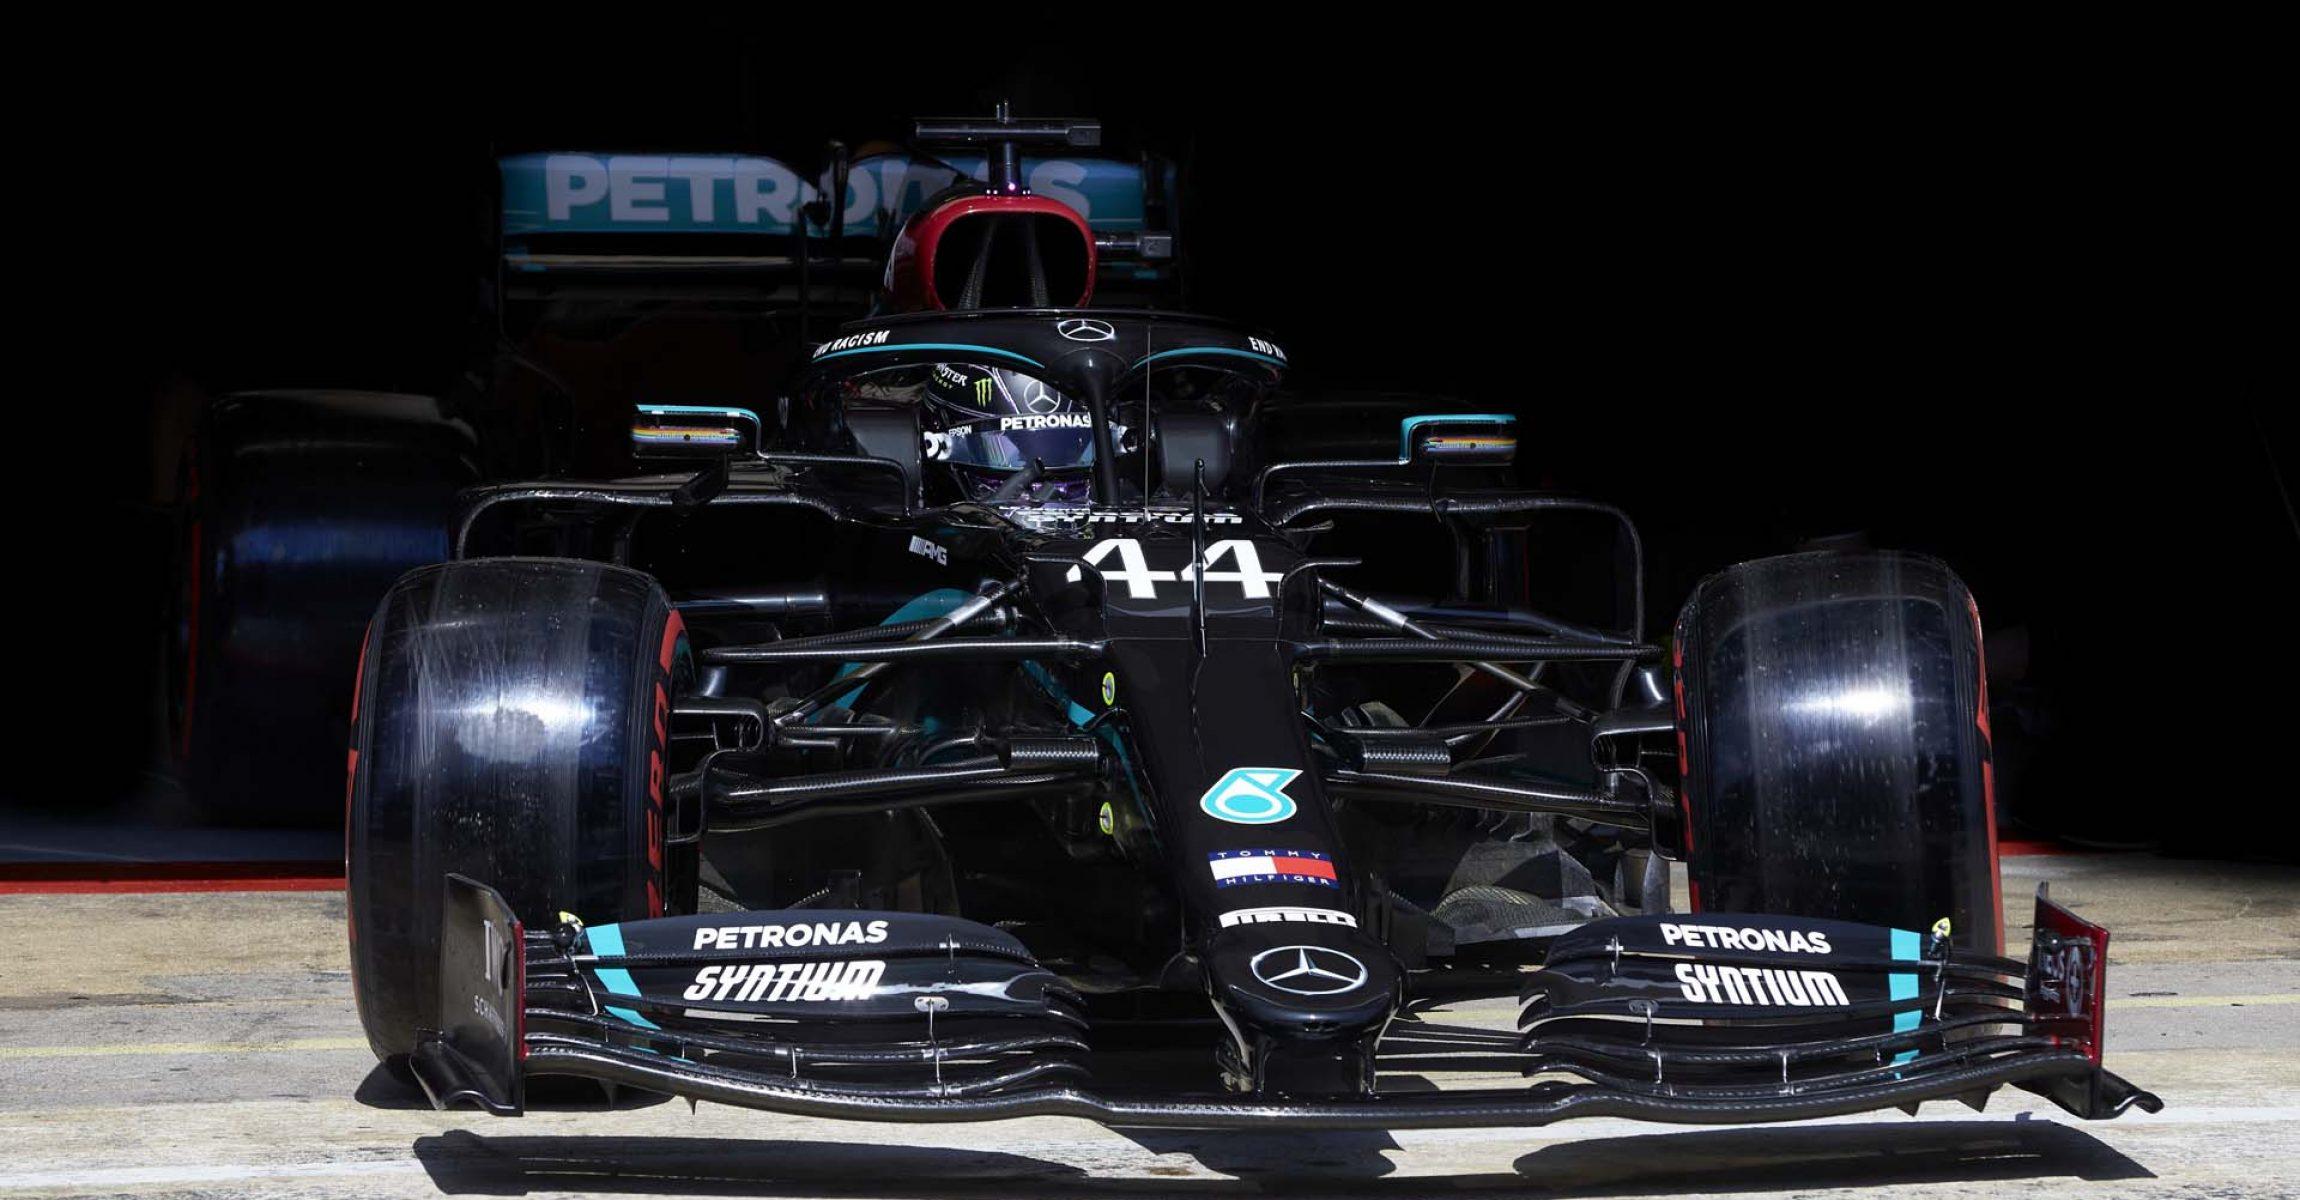 2020 Spanish Grand Prix, Saturday - Steve Etherington Lewis Hamilton Mercedes